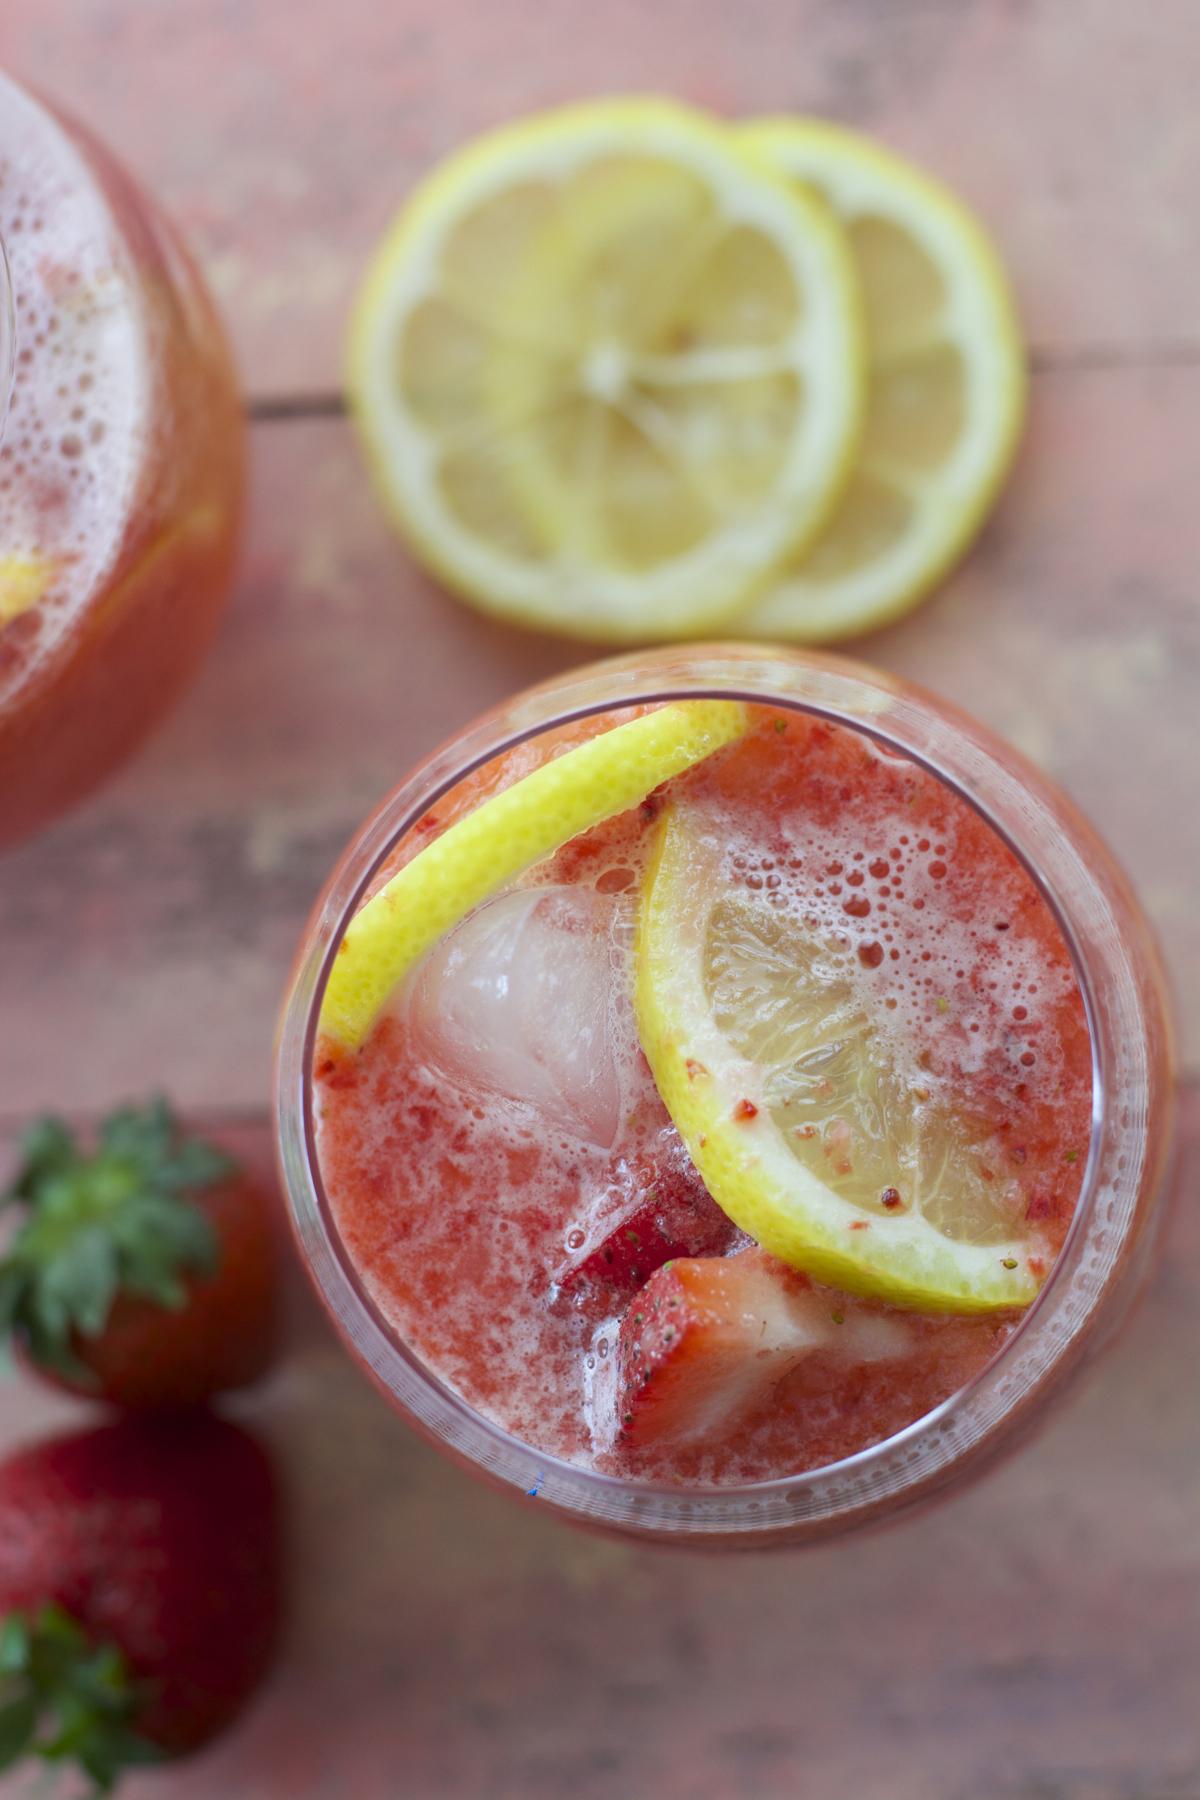 overhead view of a glass of homemade strawberry lemonade